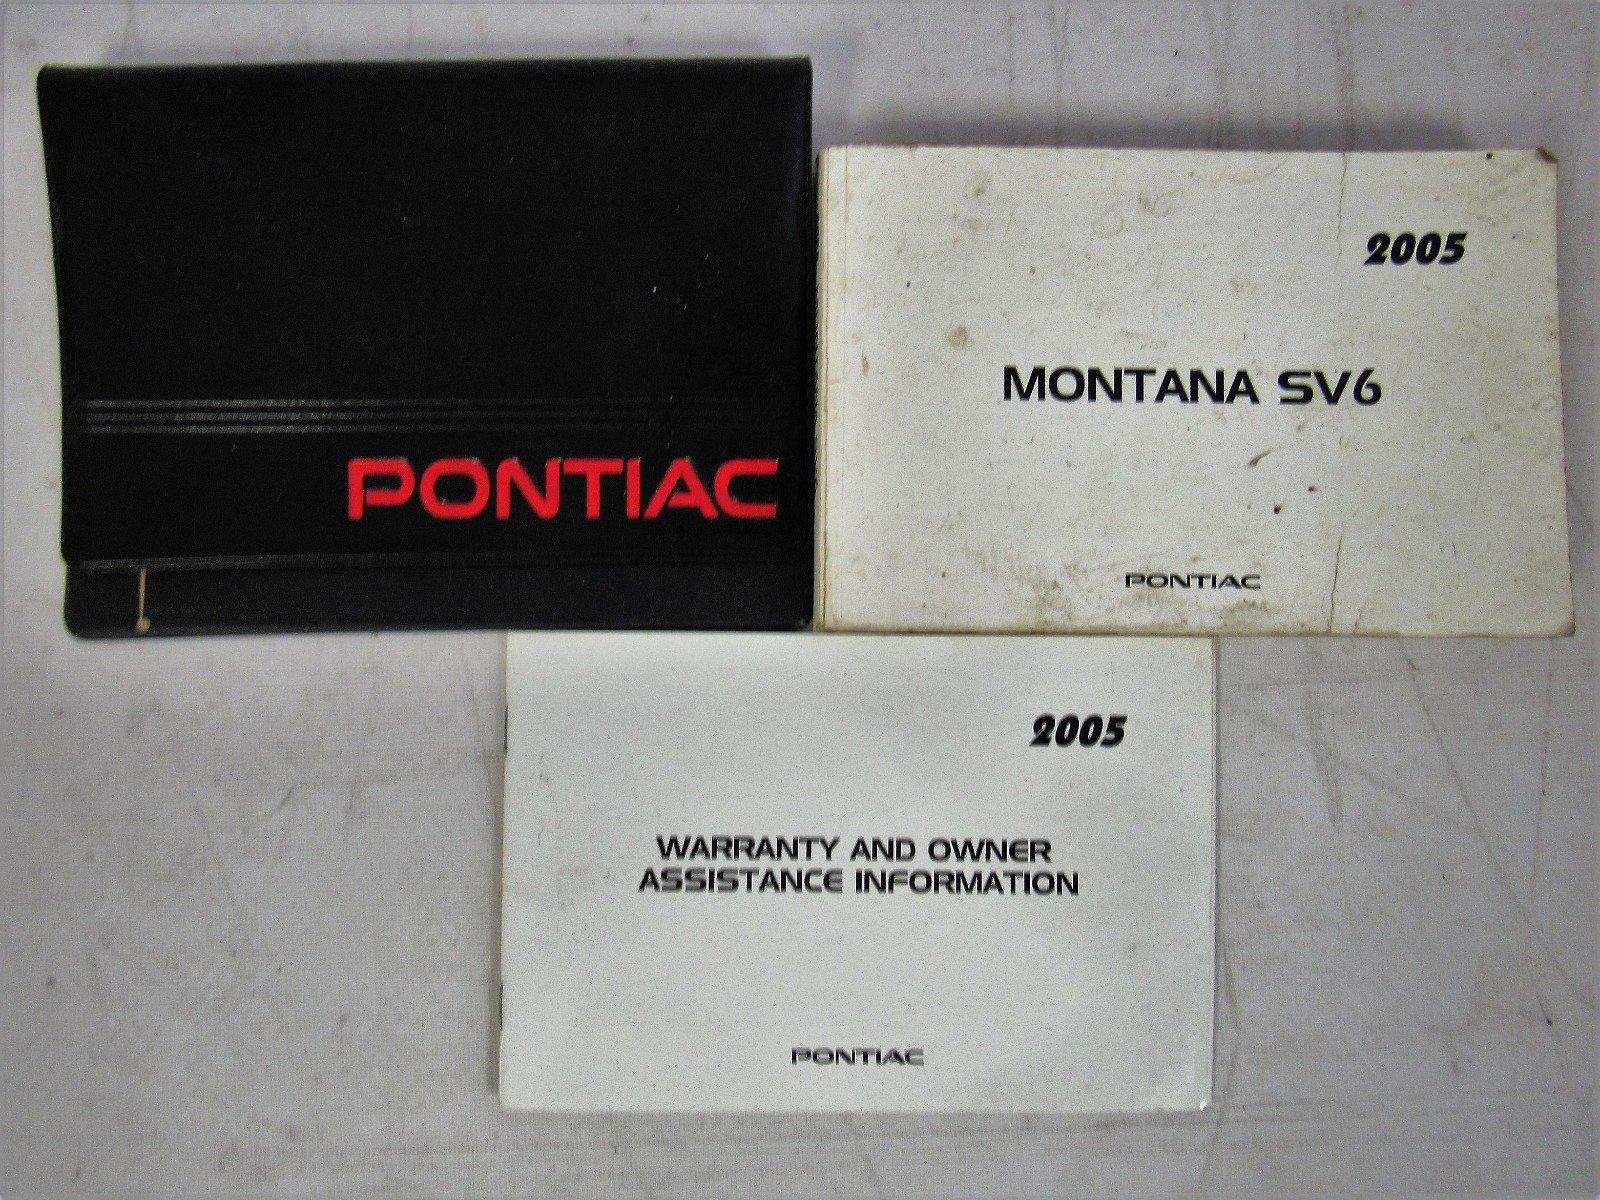 2005 pontiac montana sv6 user manual